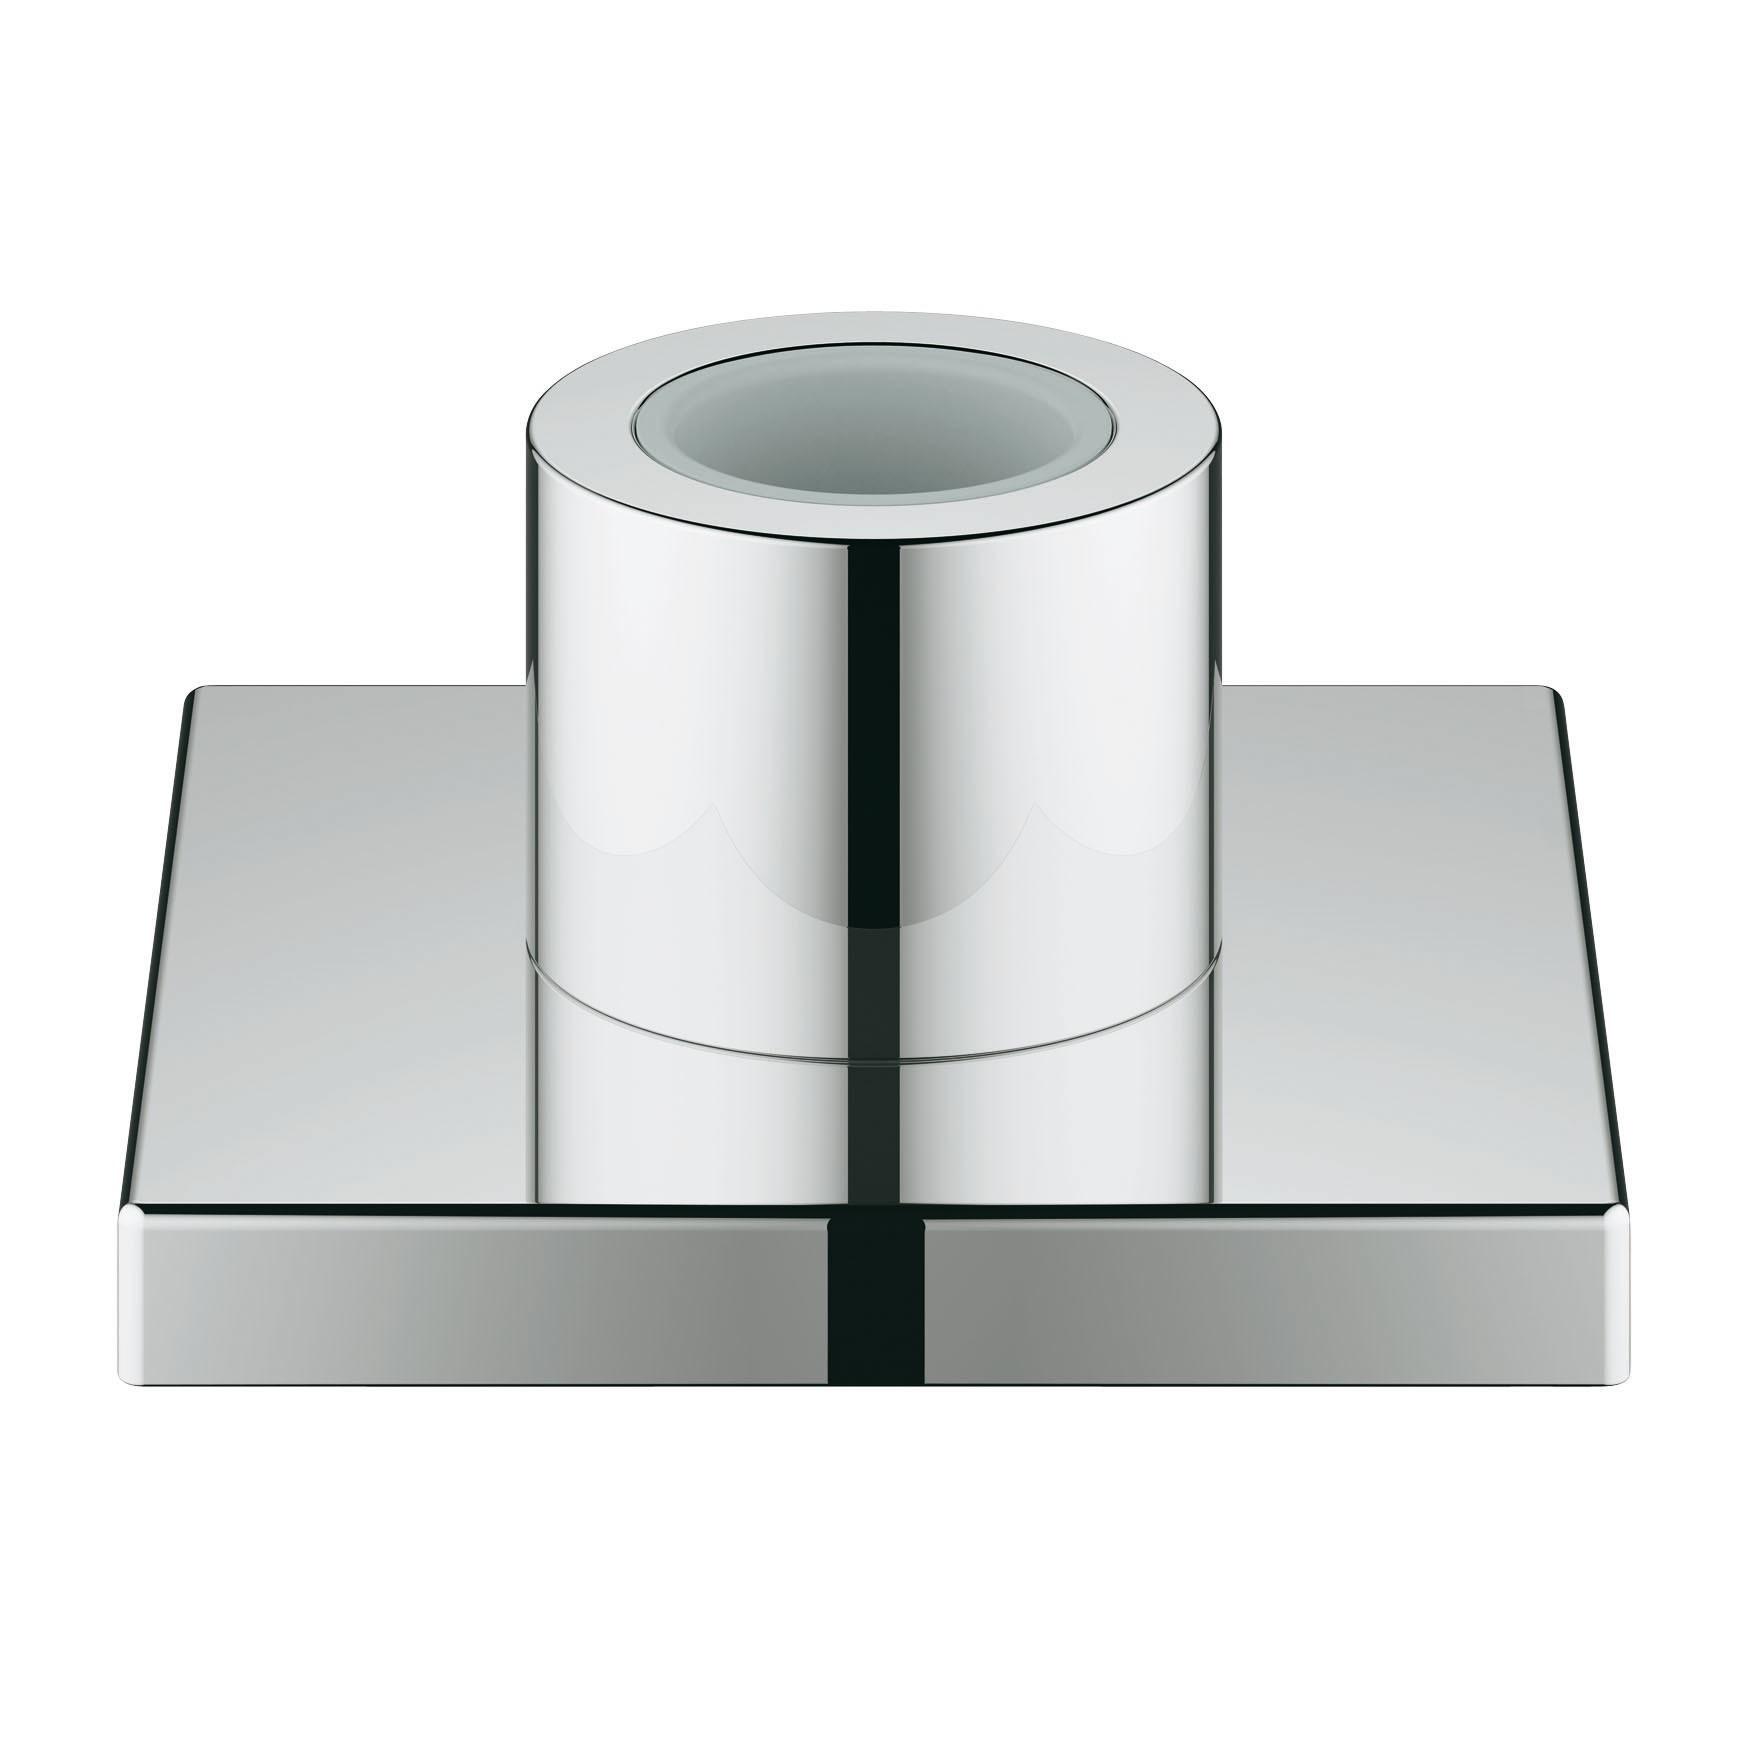 Вывод ручного душа Grohe Allure F-digital 27930000